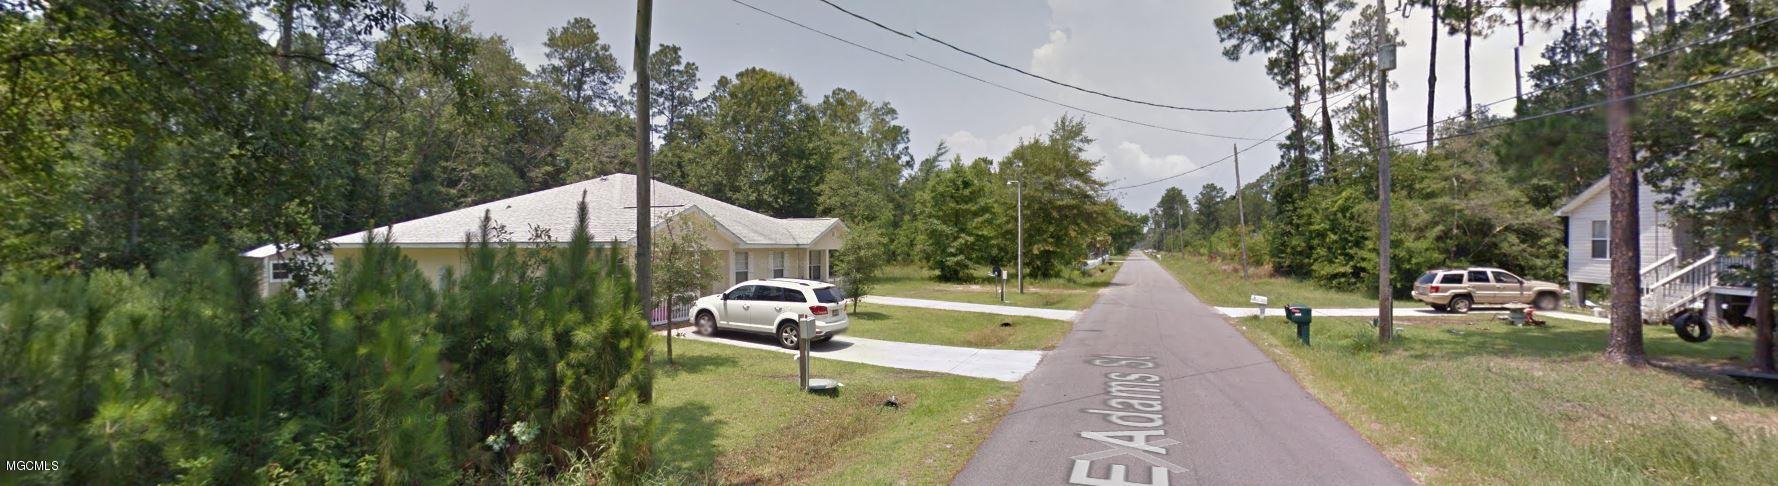 6039 Adams St,Bay St. Louis,Mississippi 39520,Multi-Family,Adams,317401